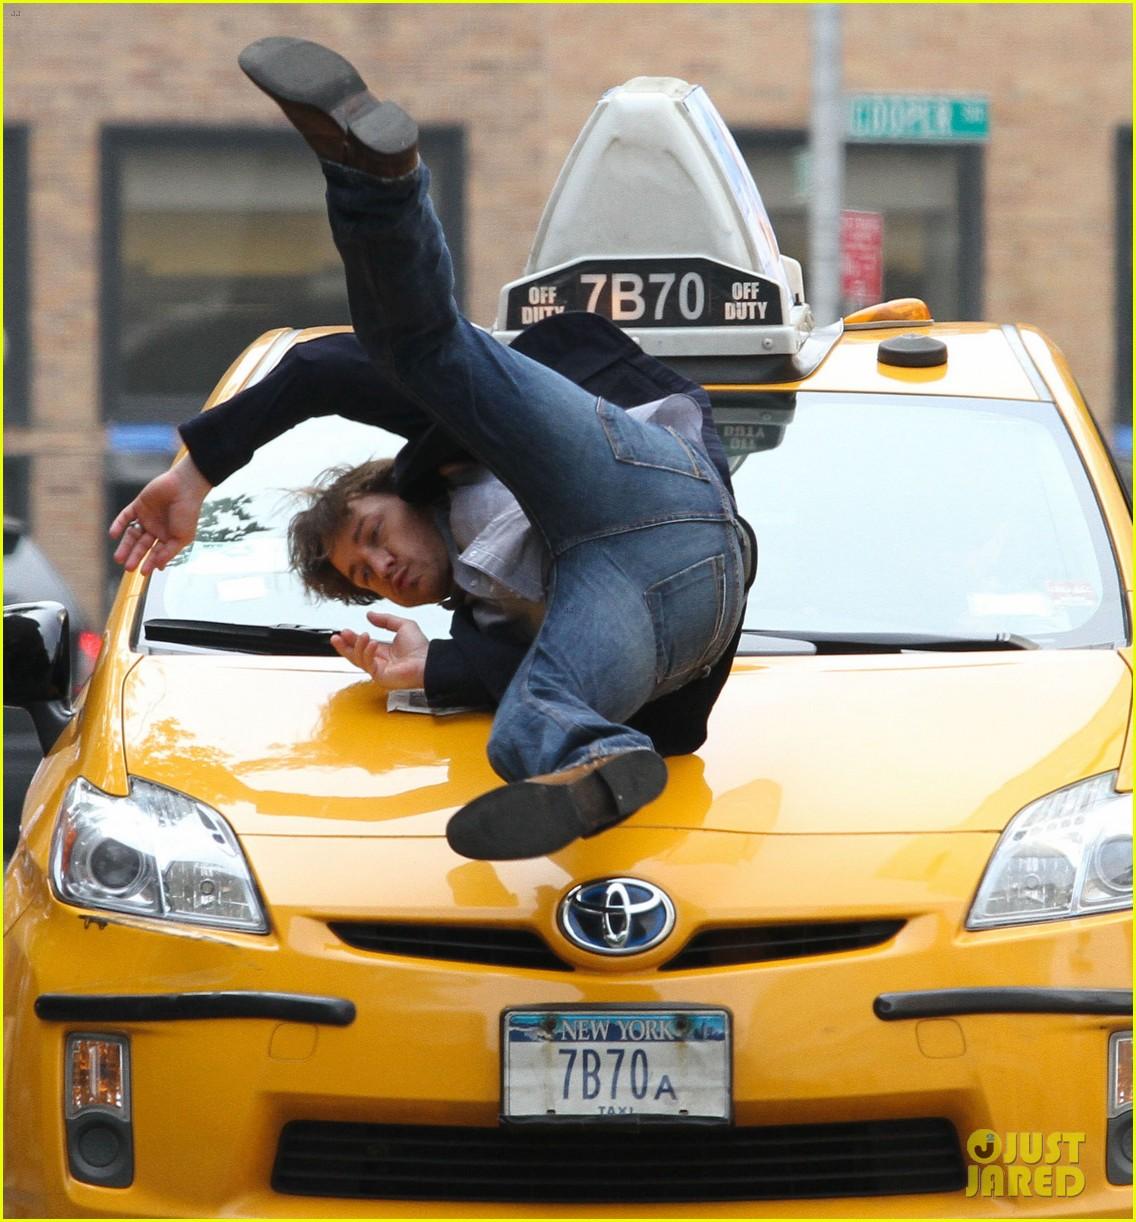 chastain cab scene 02